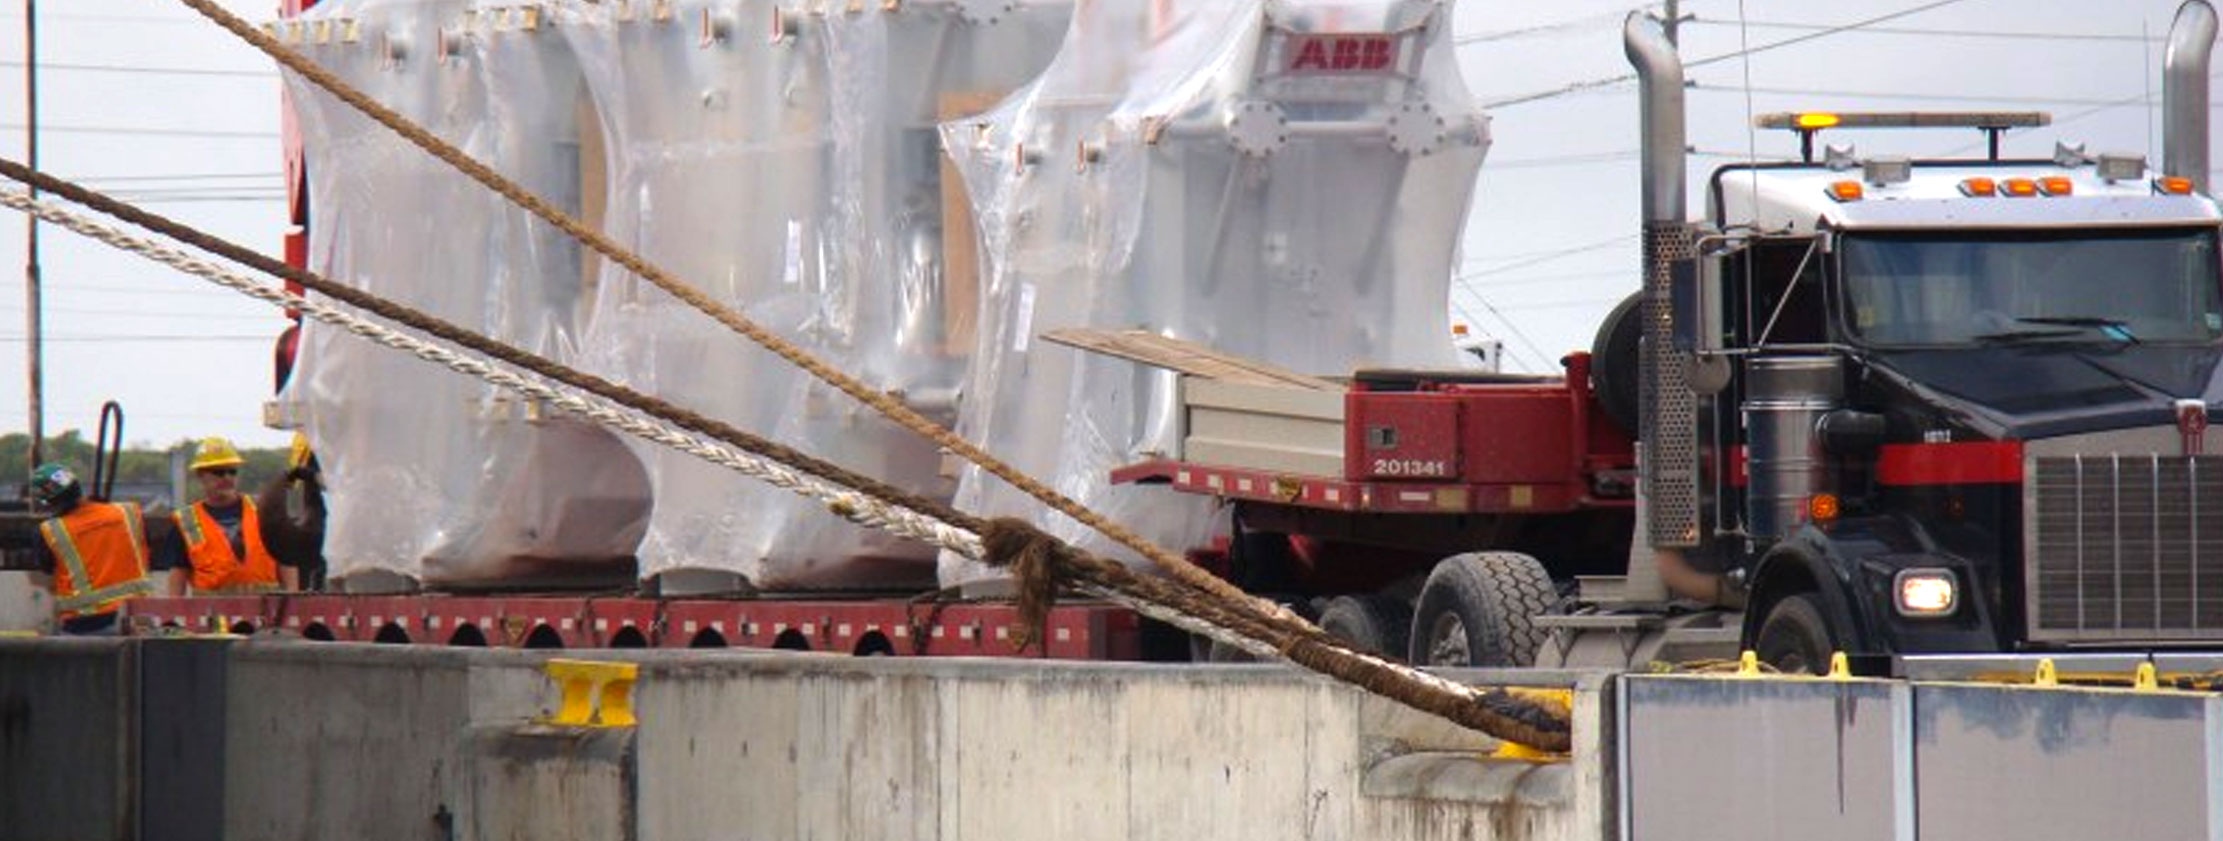 heavy lift port freeport